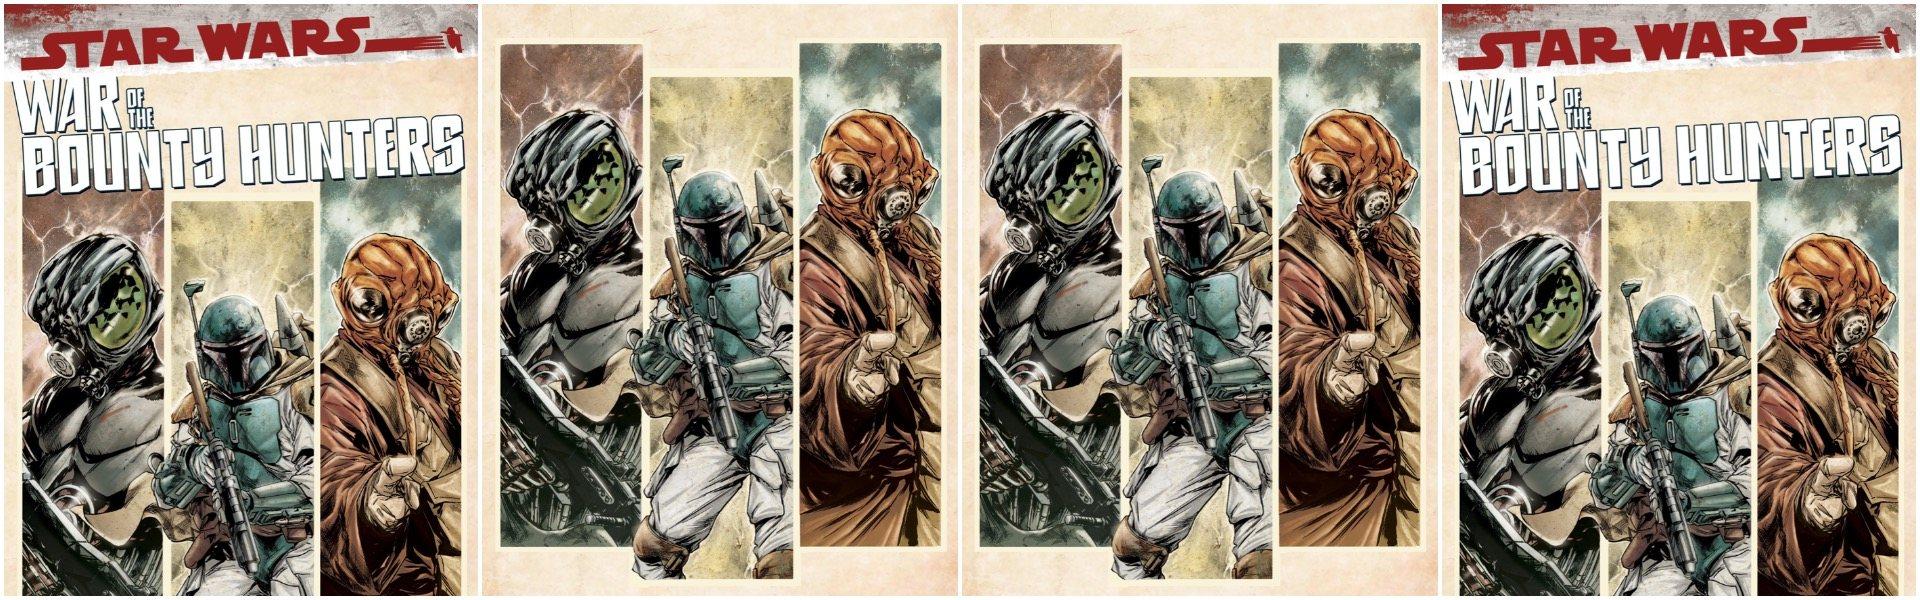 War of the Bounty Hunters #1 Paolo Villanelli Variants